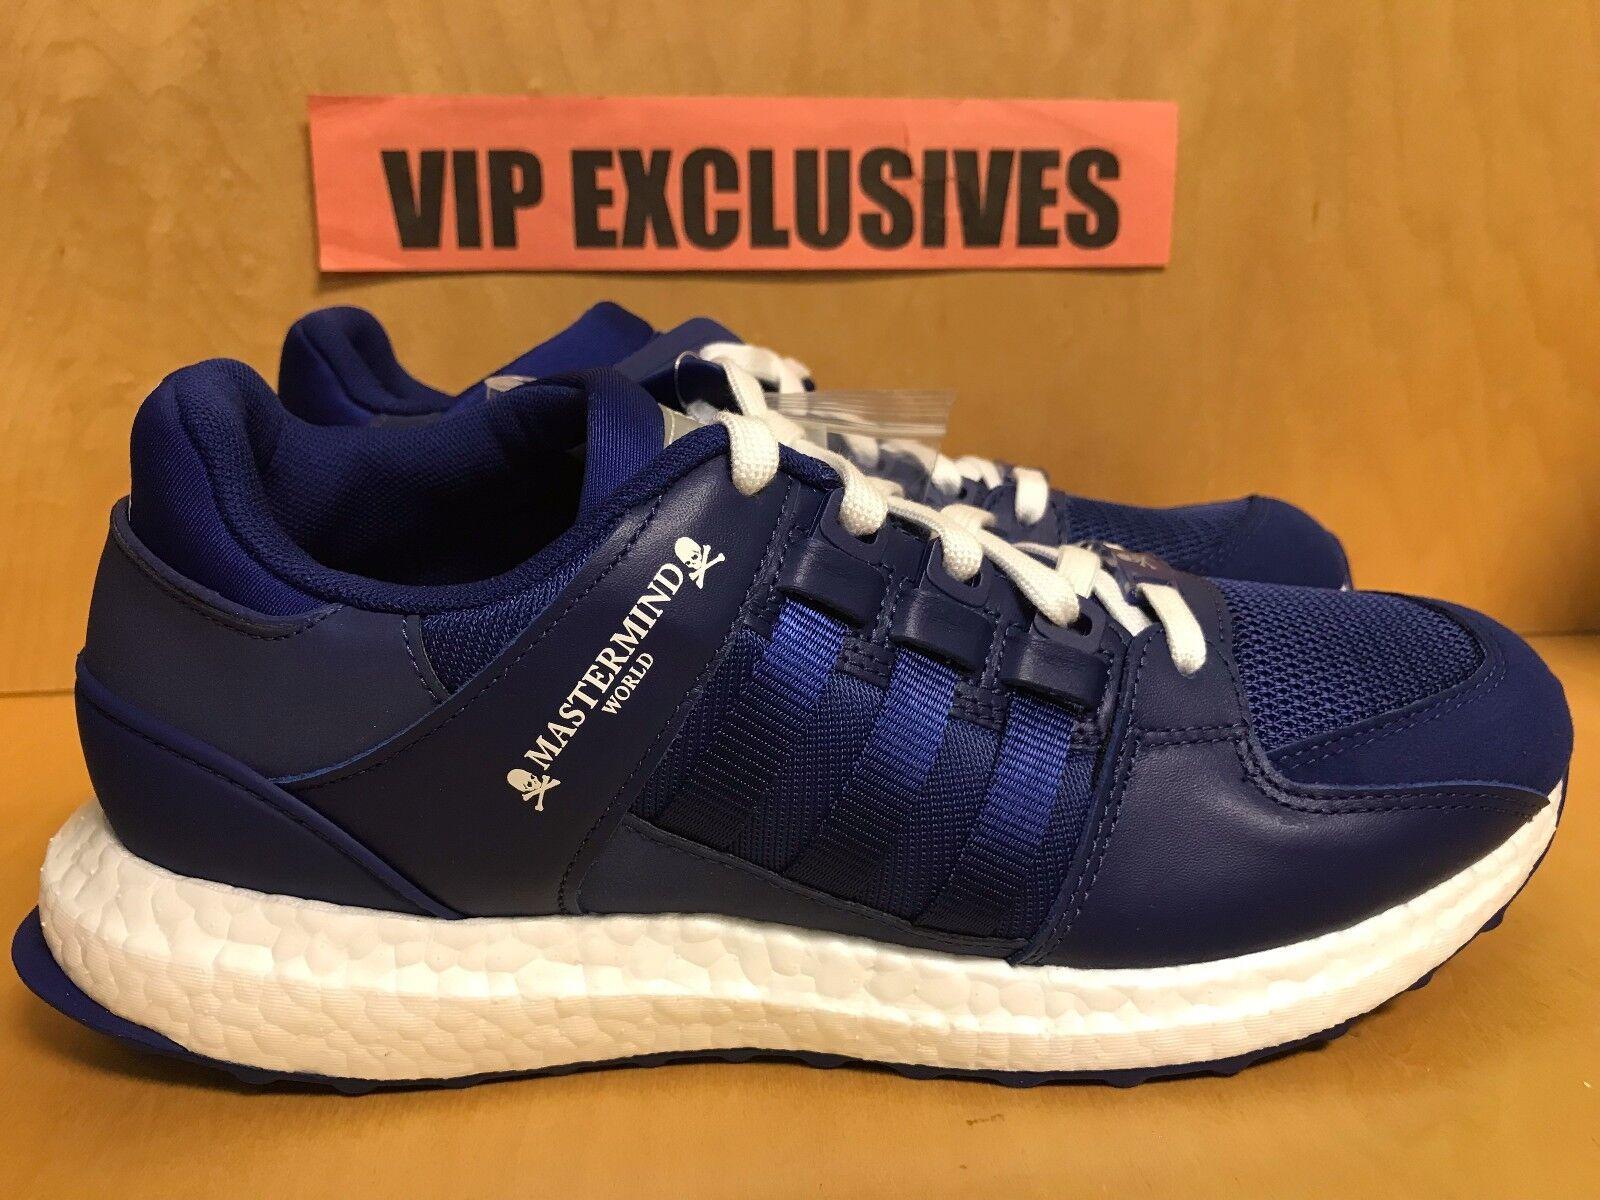 Adidas x Mastermind EQT Support Ultra MMW Blue Mystery Ink CQ1827 LIMITED